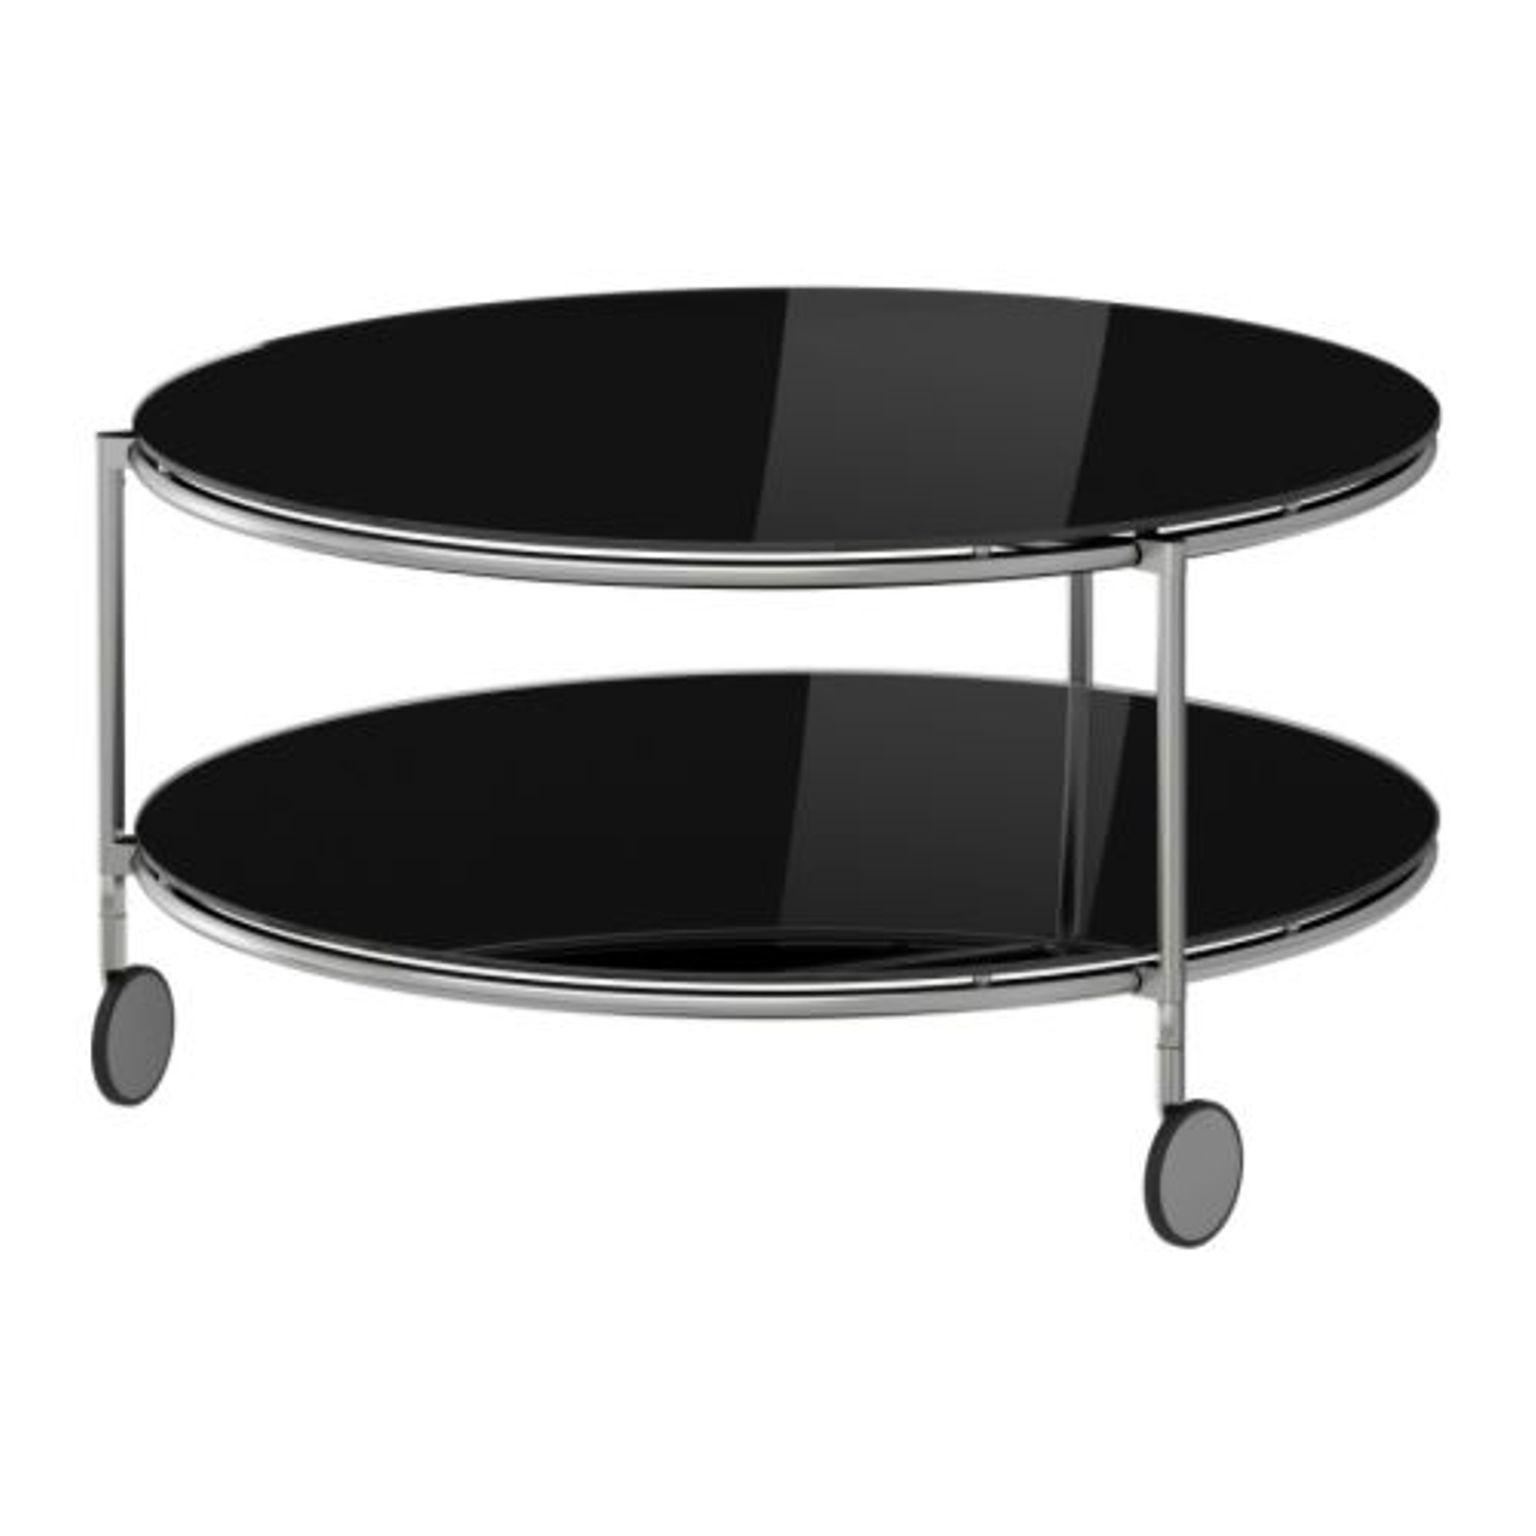 Couchtisch Ikea Schwarz